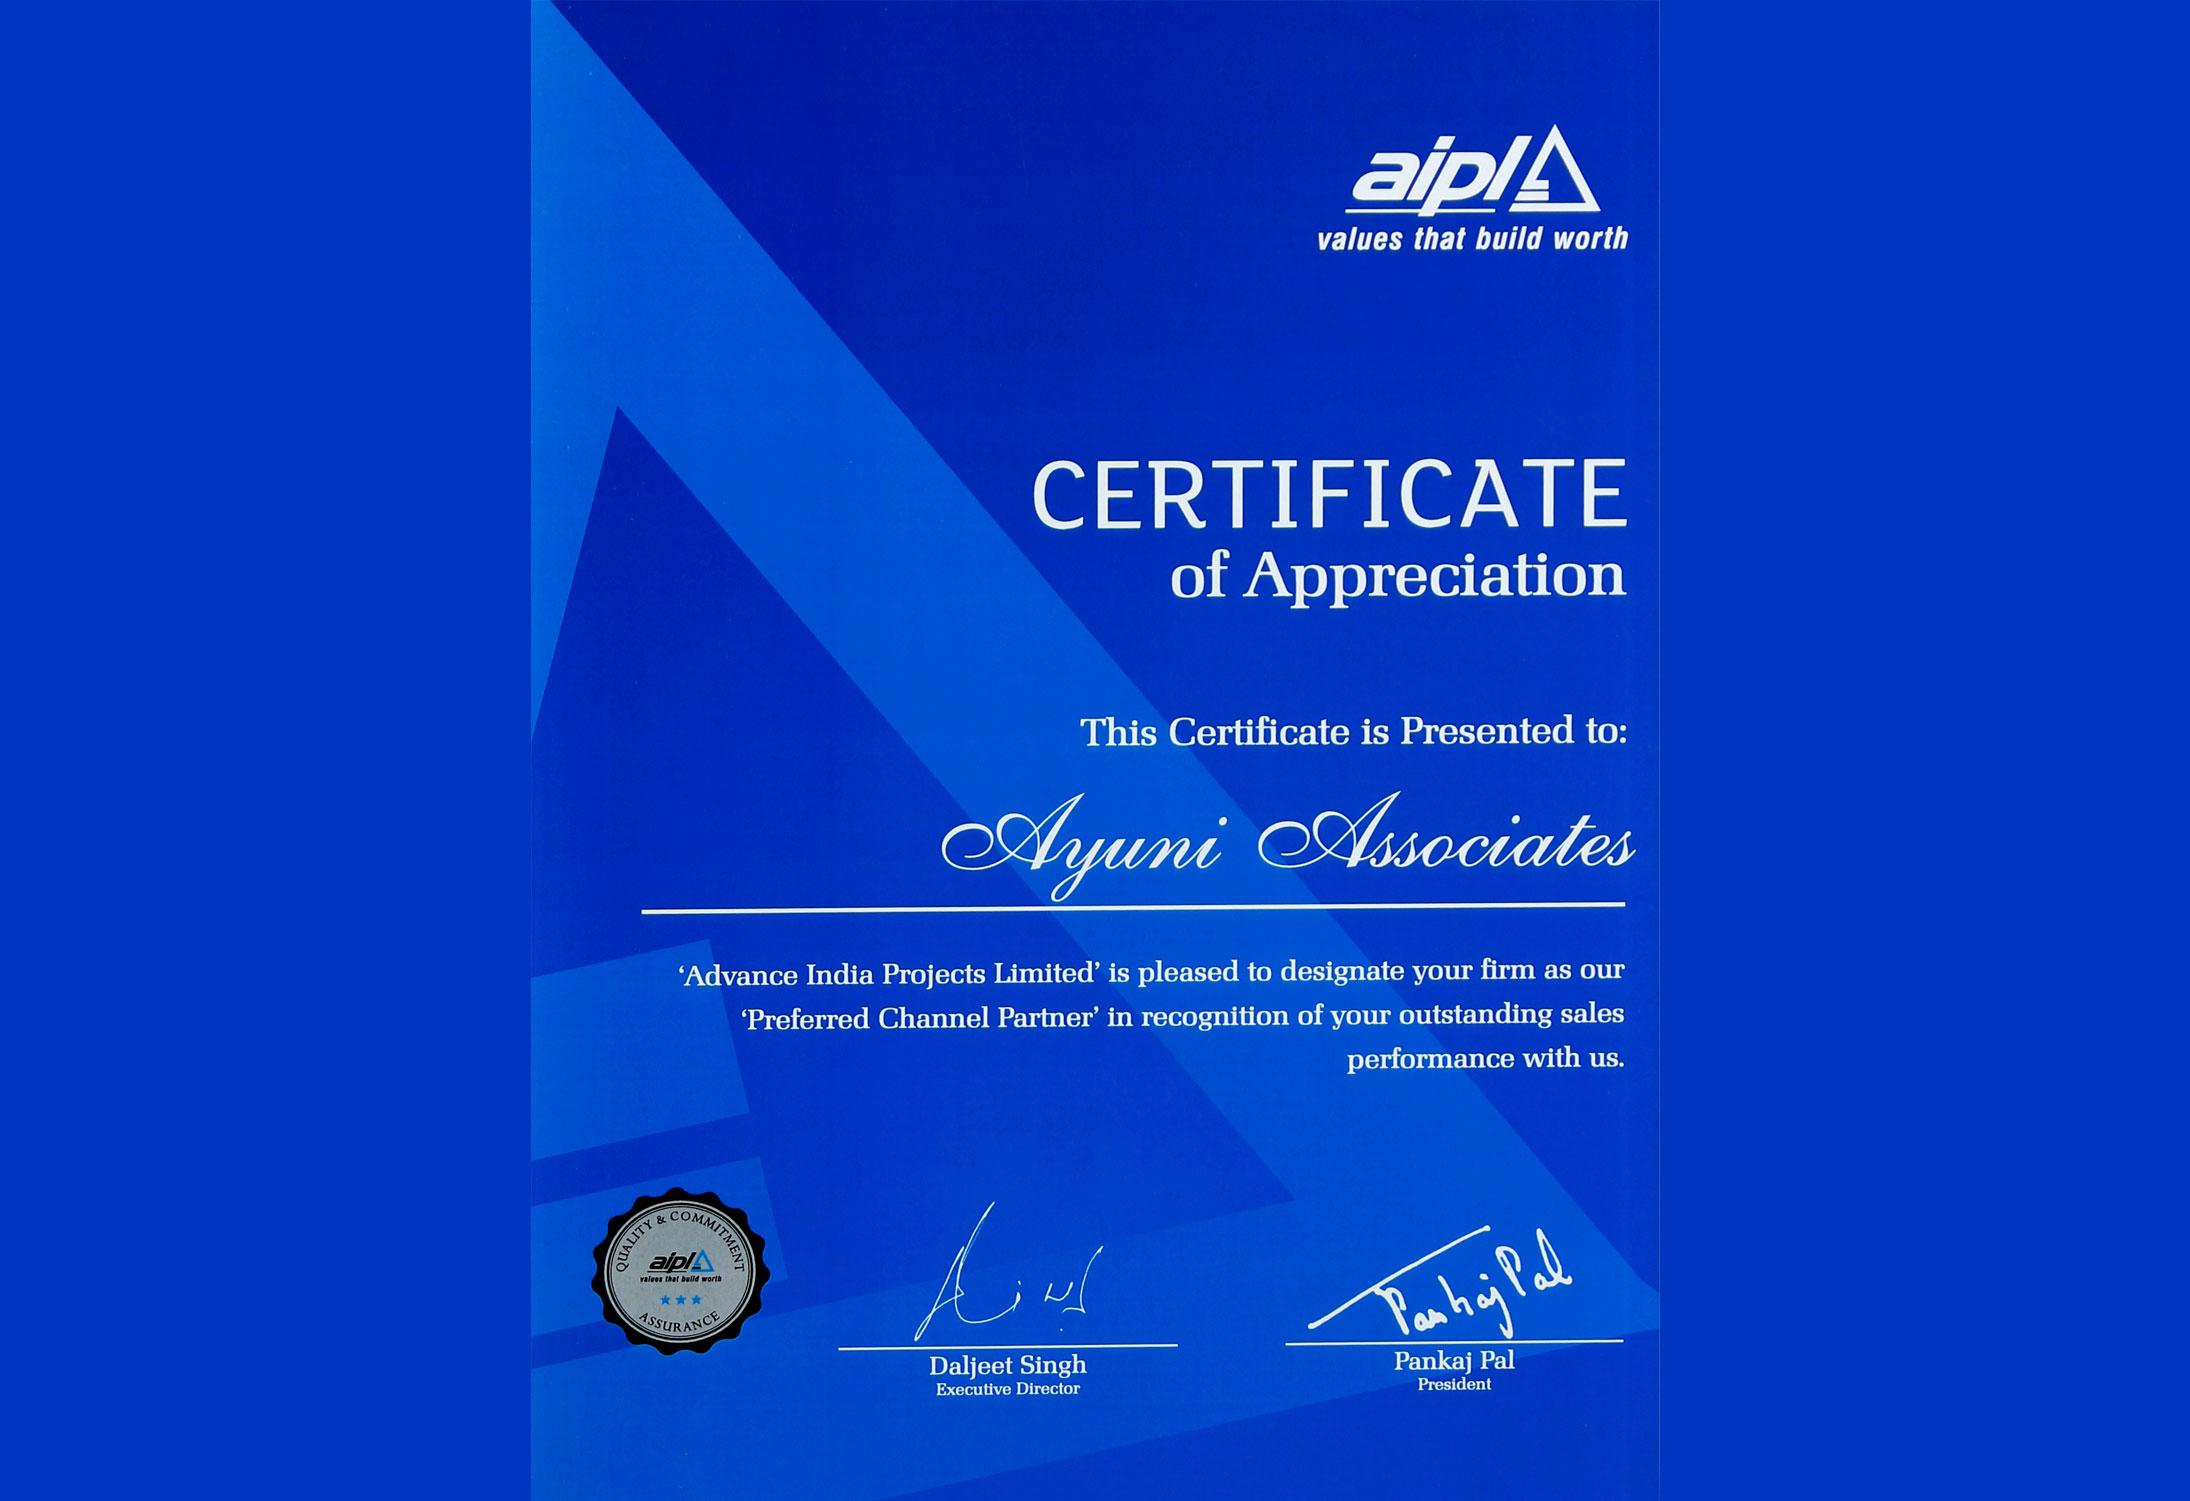 AIPL - Certificate of Appreciation